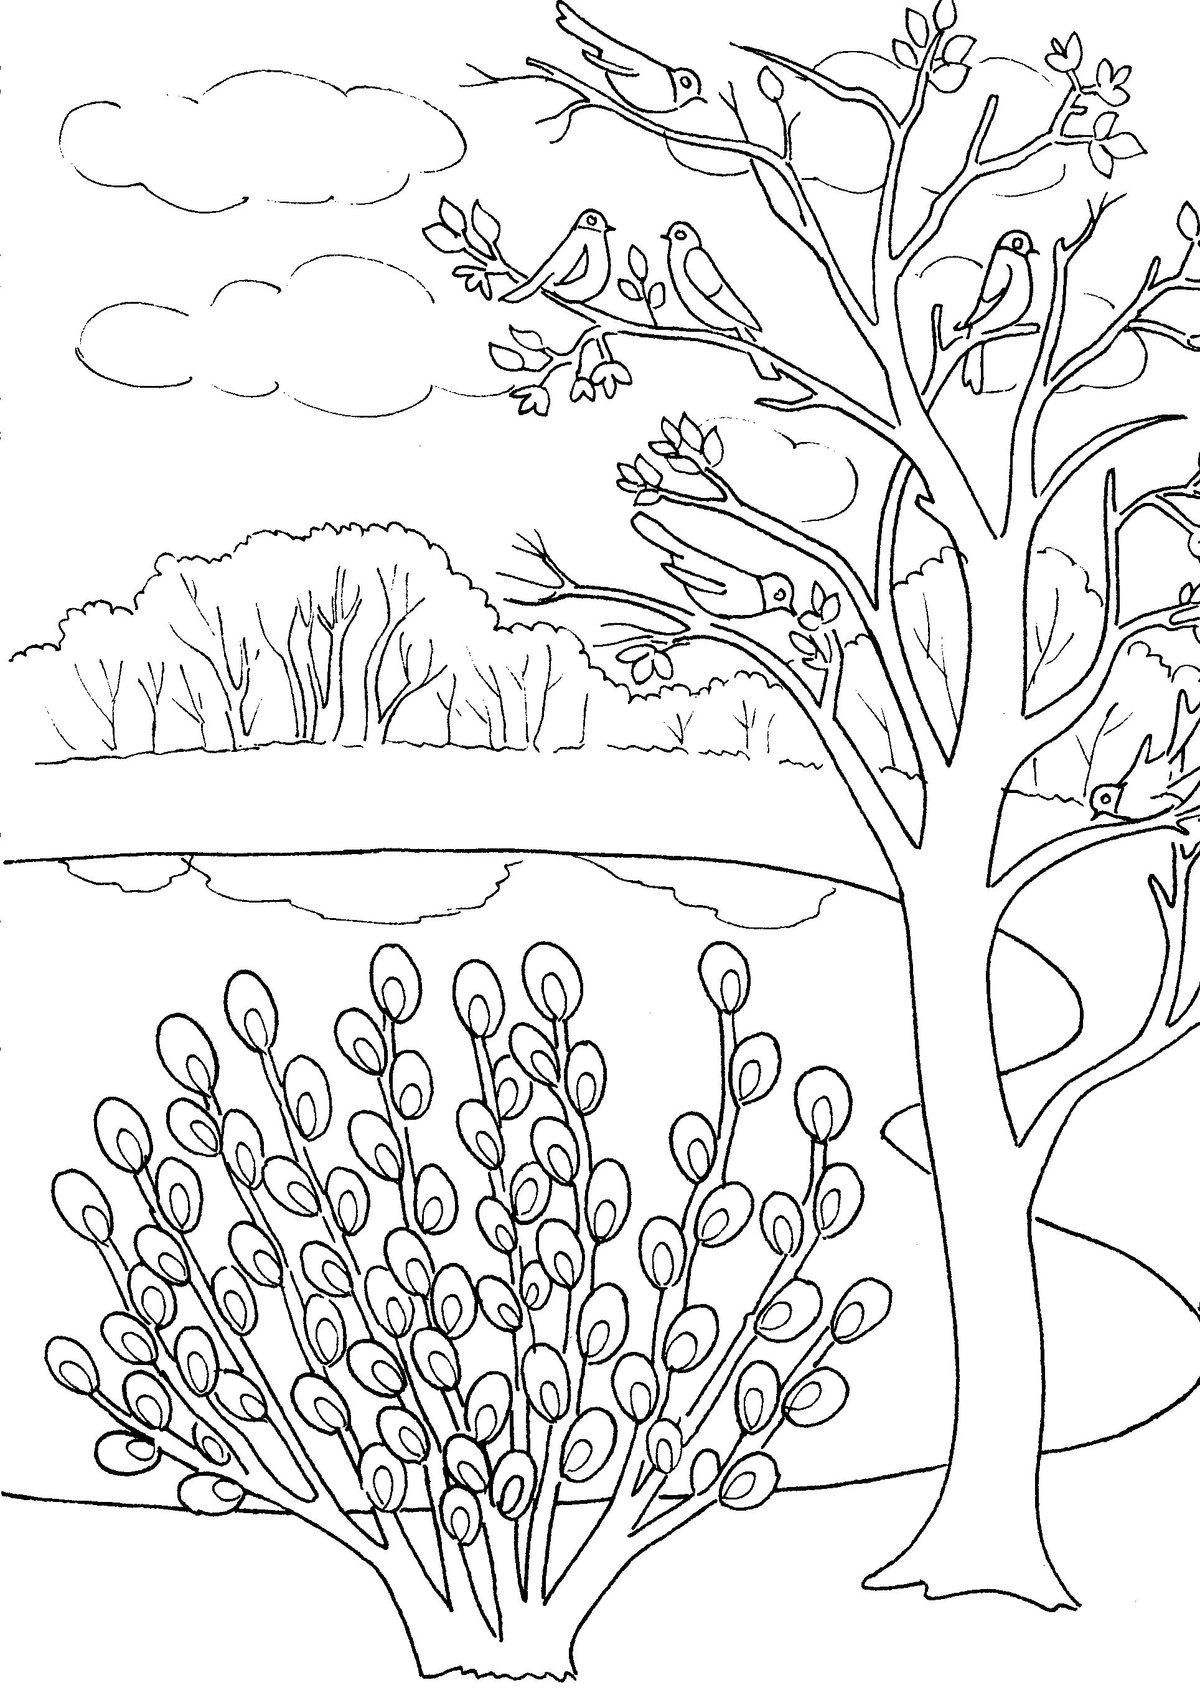 Весна рисунок карандашом